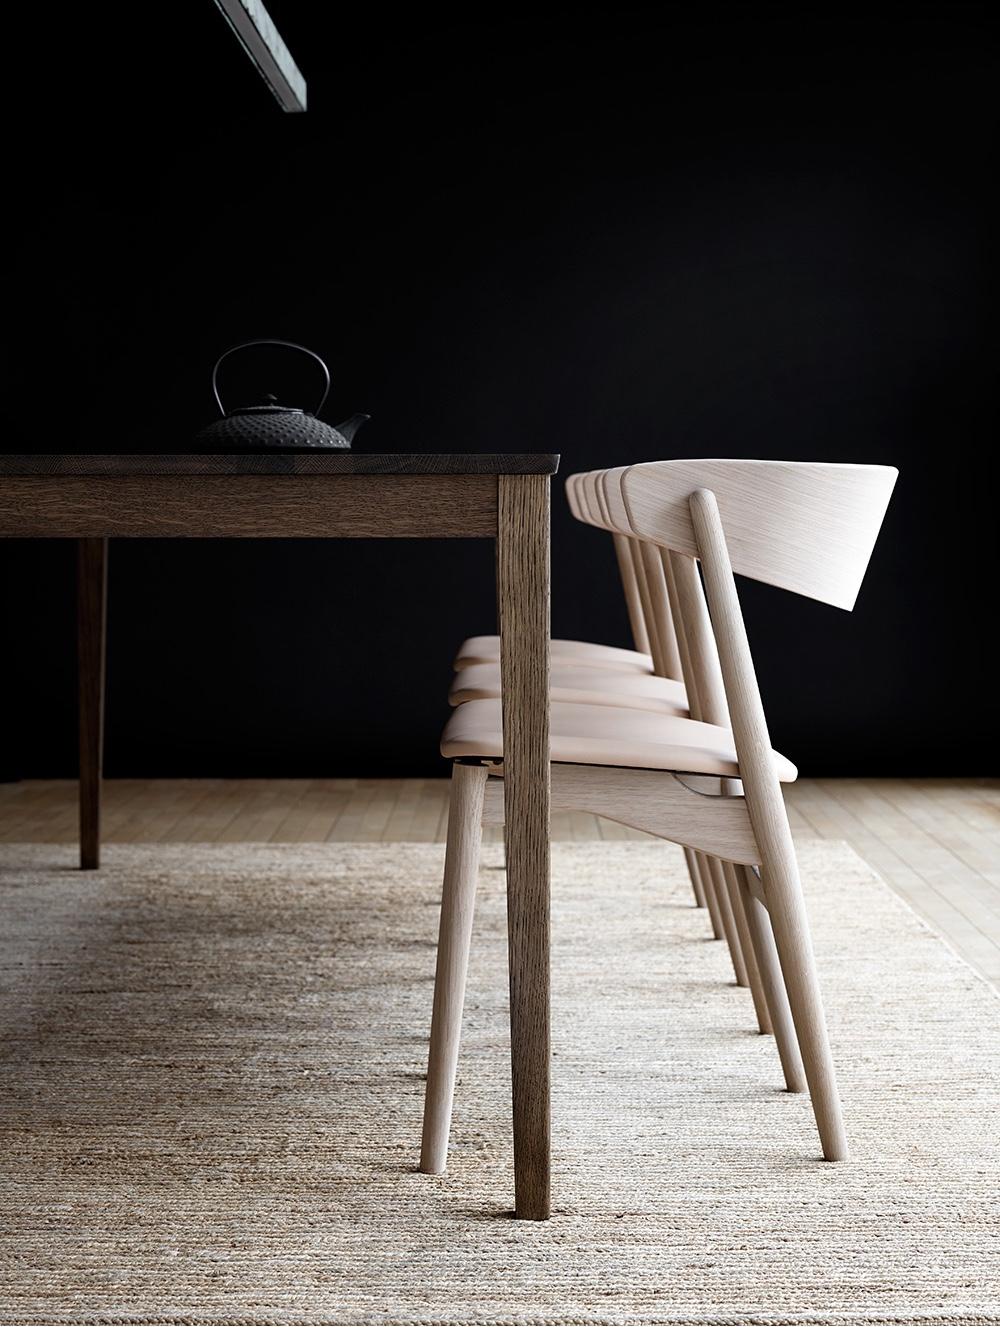 Sibast No 7 by Helge Sibast for Sibast Furniture.Leather: Senegalin honey.